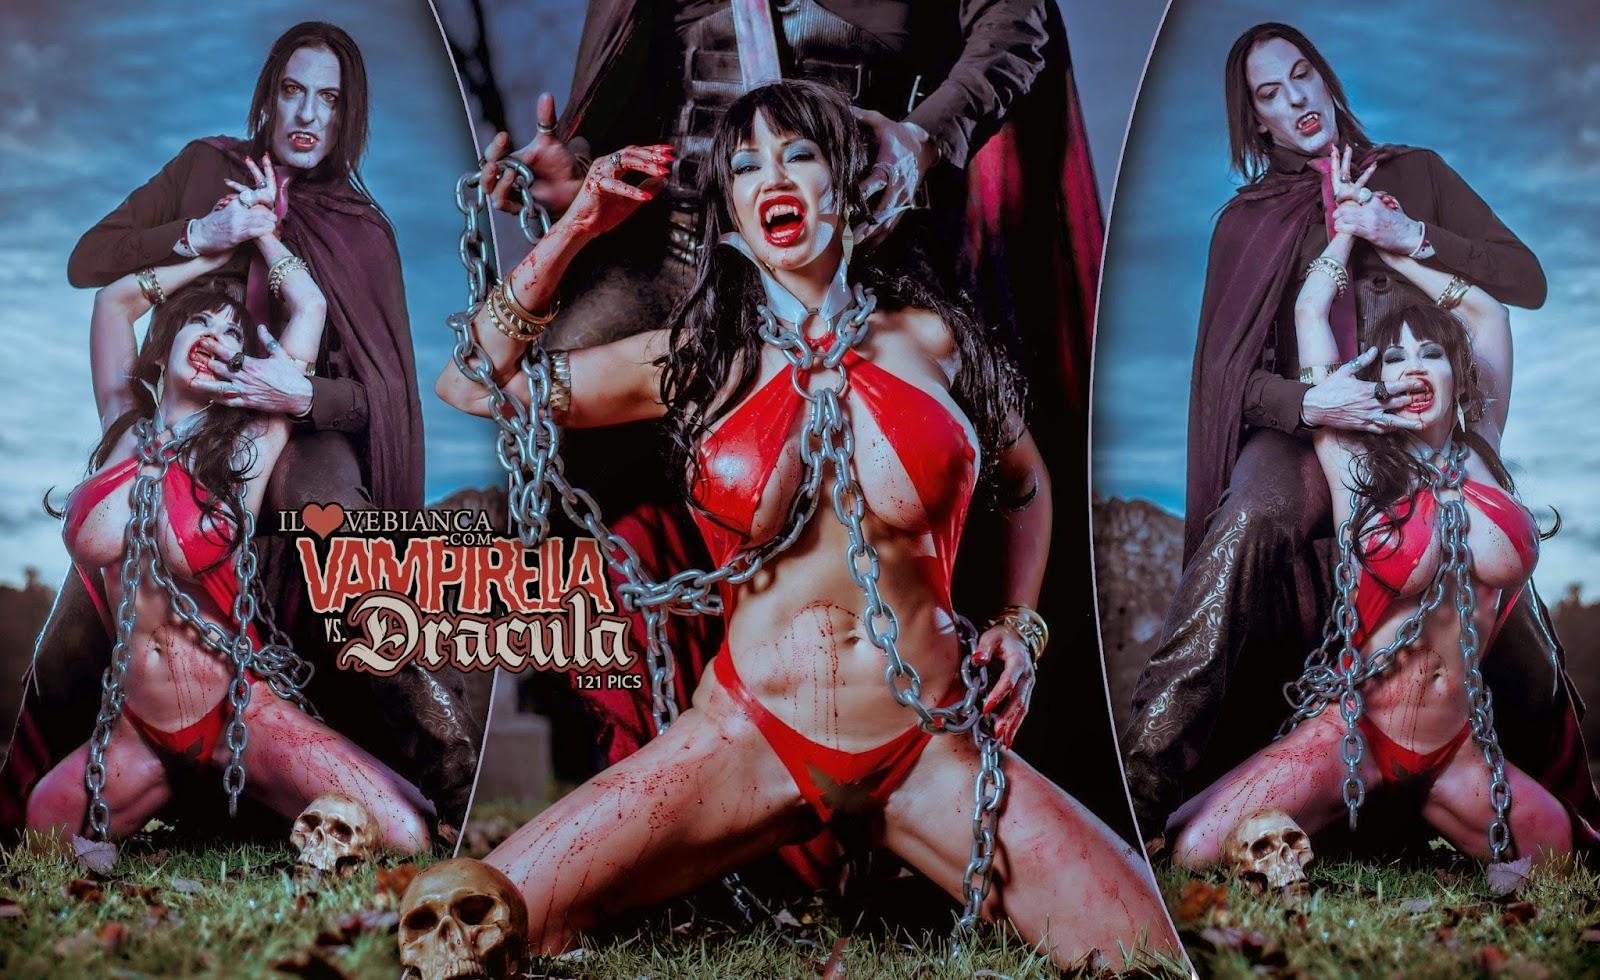 Vampire lady hentai sex scene